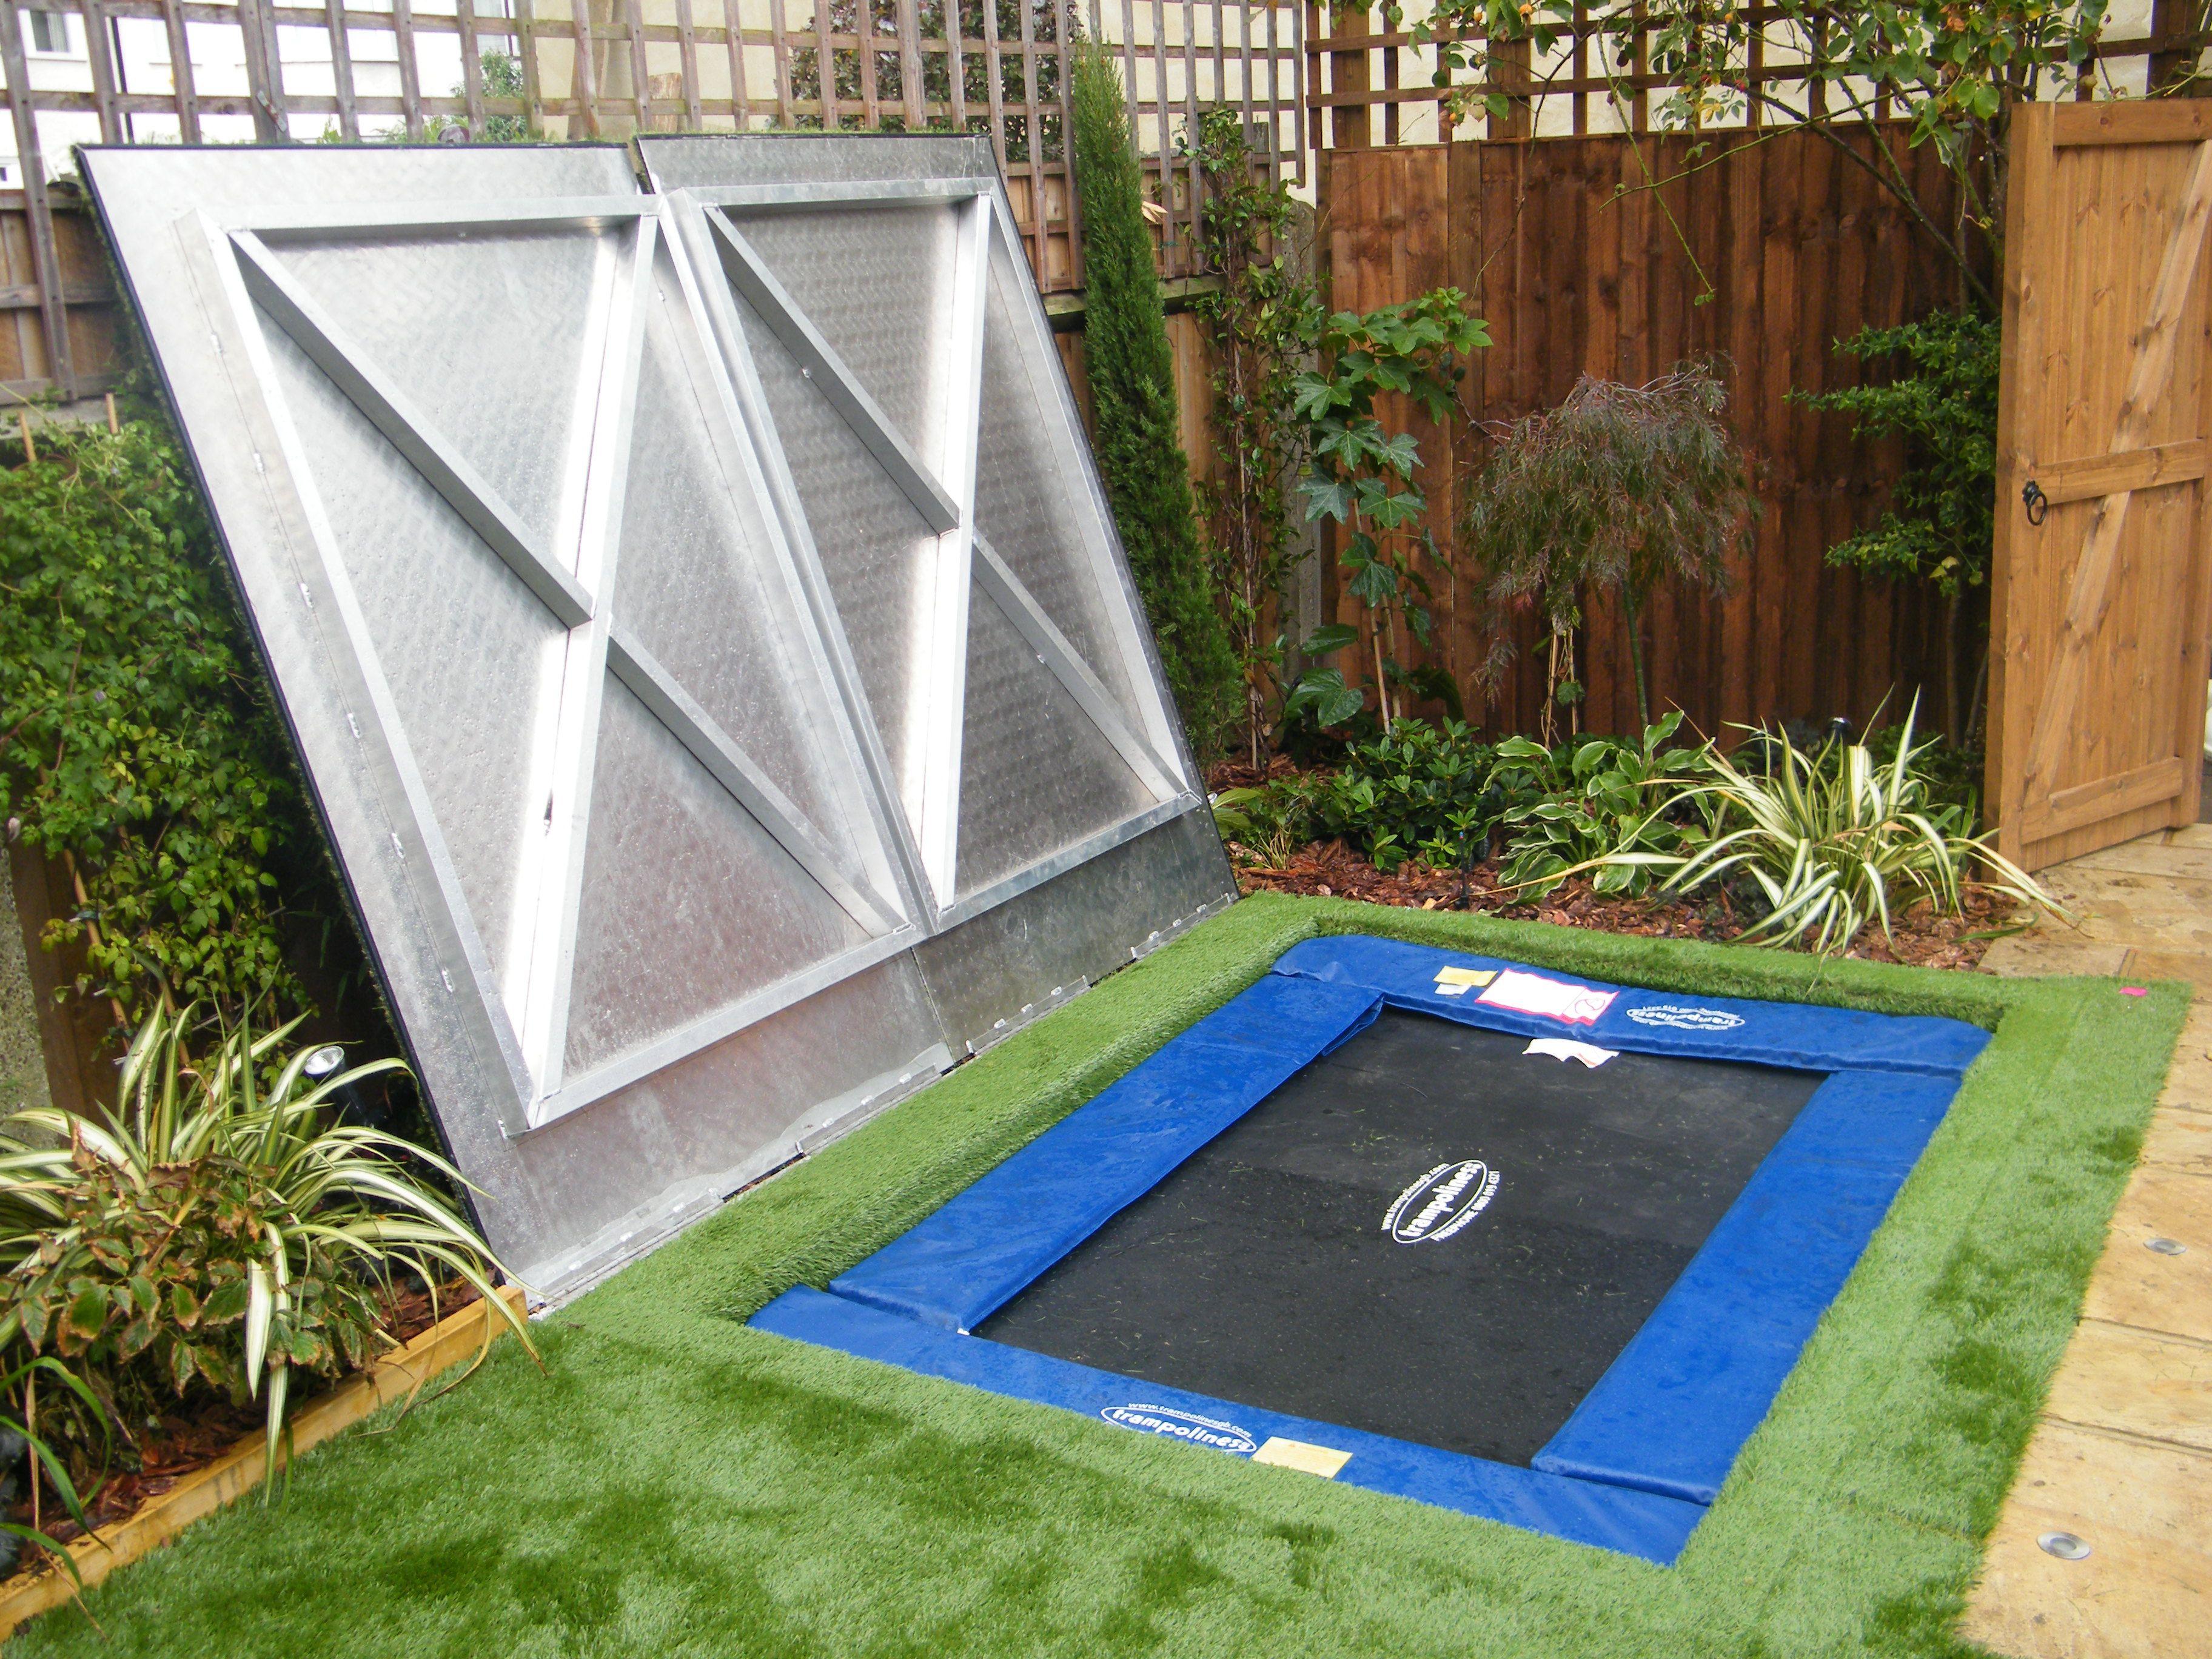 Garden Design With Trampoline hidden trampoline dulwich | our home projects | pinterest